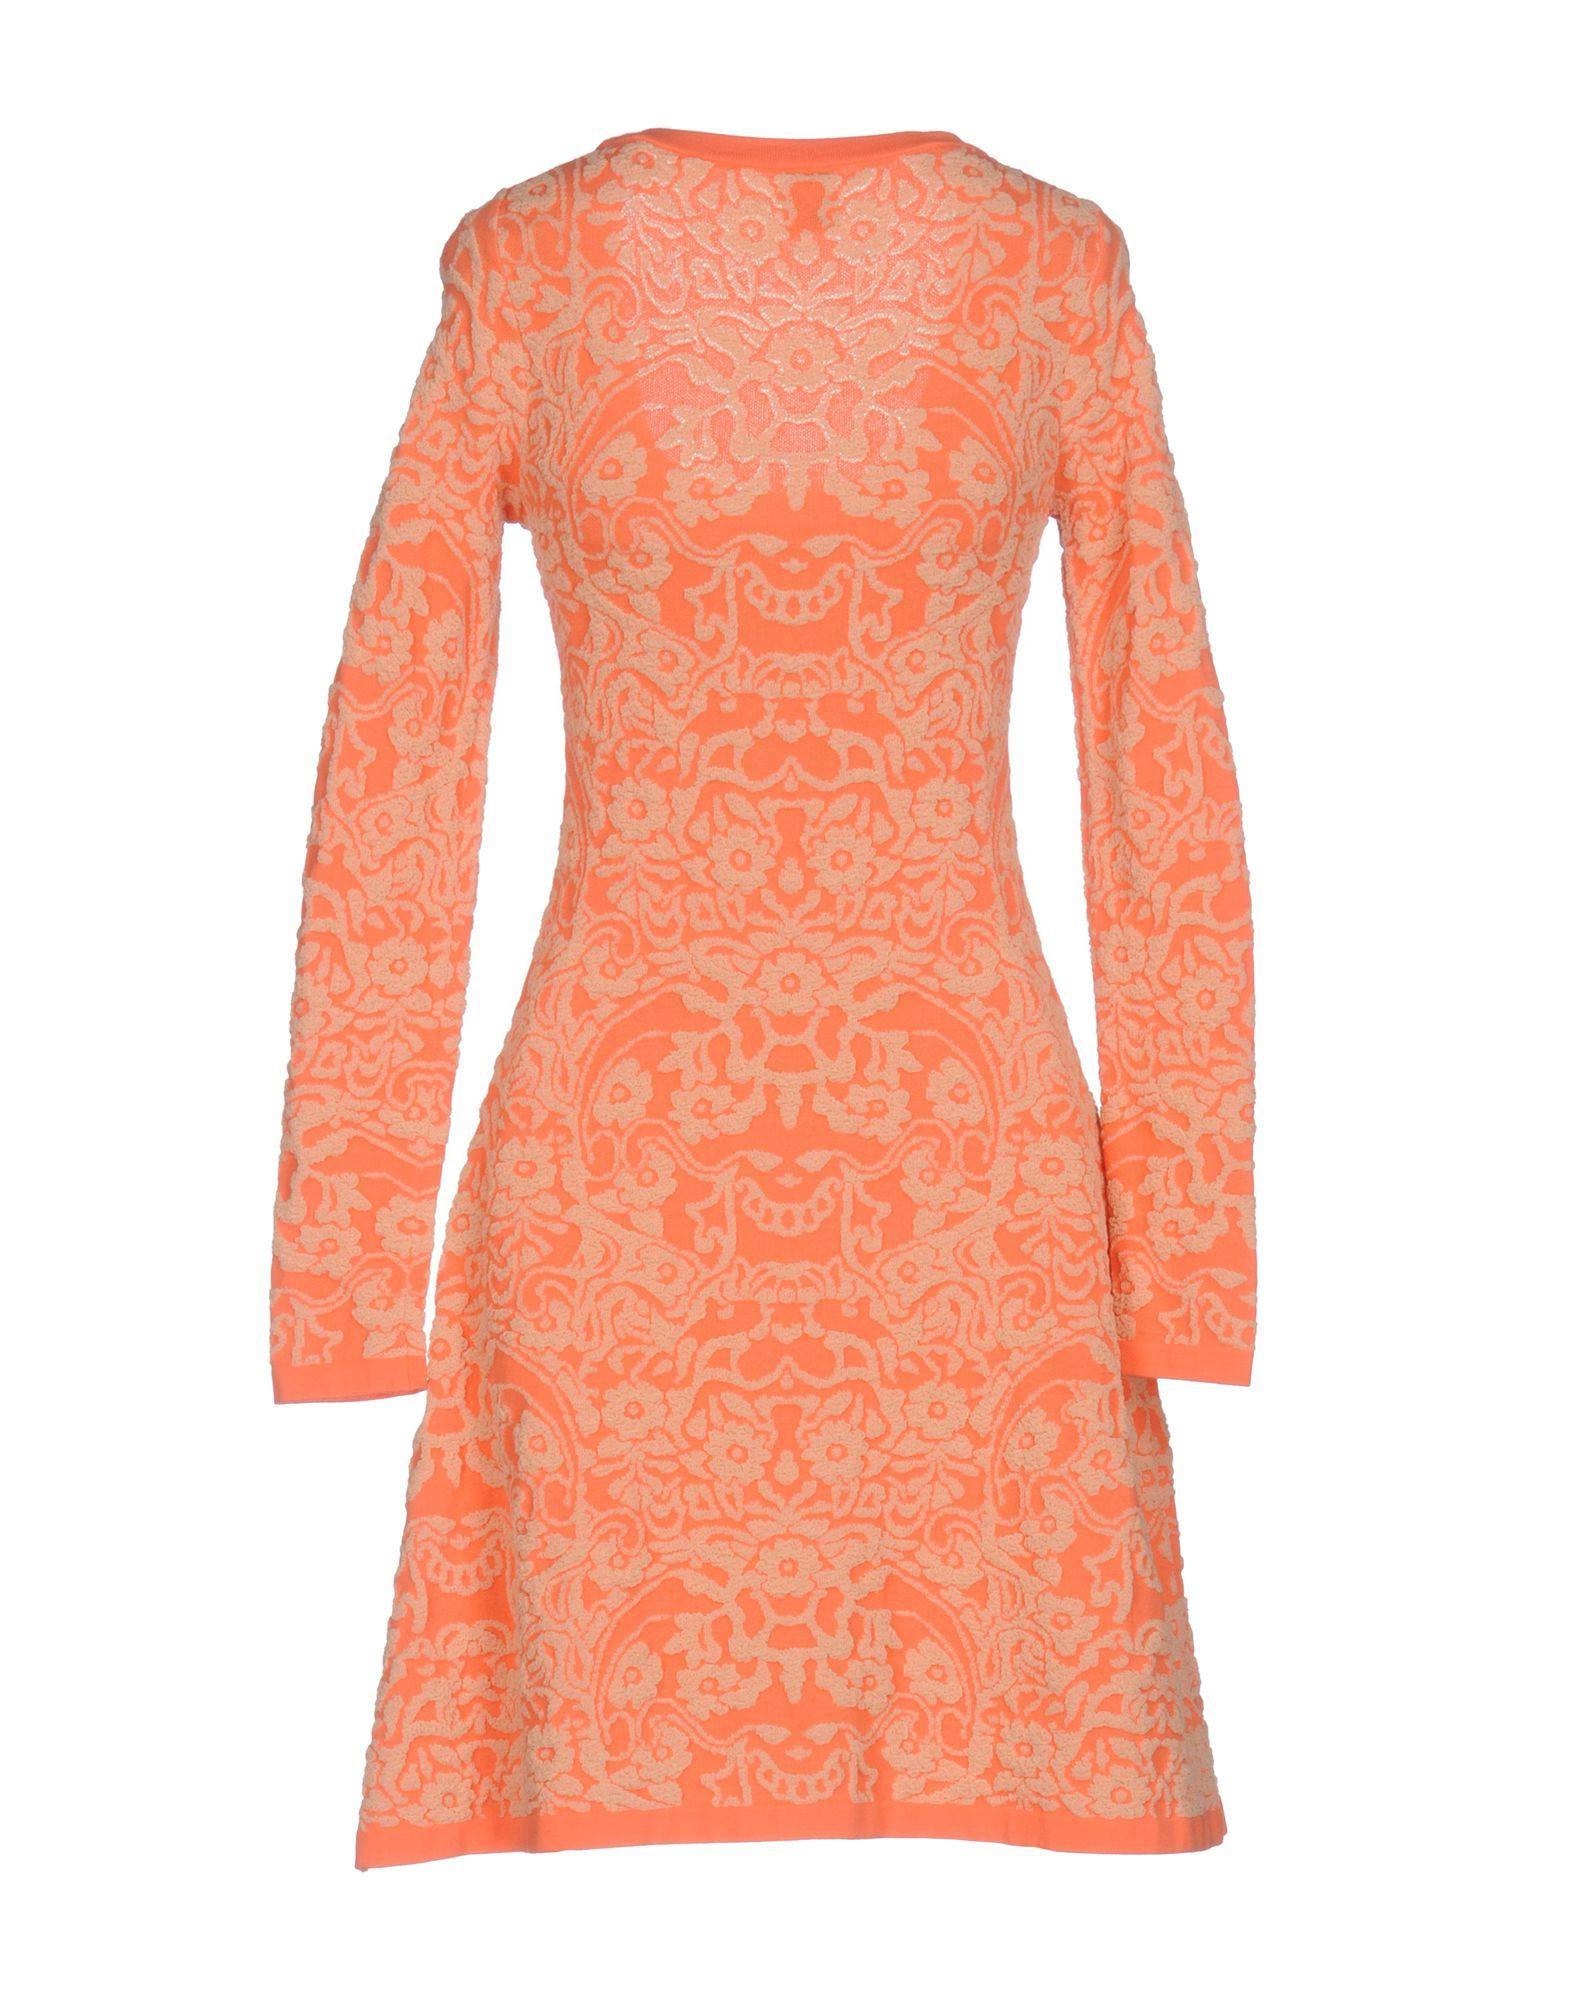 M Missoni Coral Knit Long Sleeve Dress